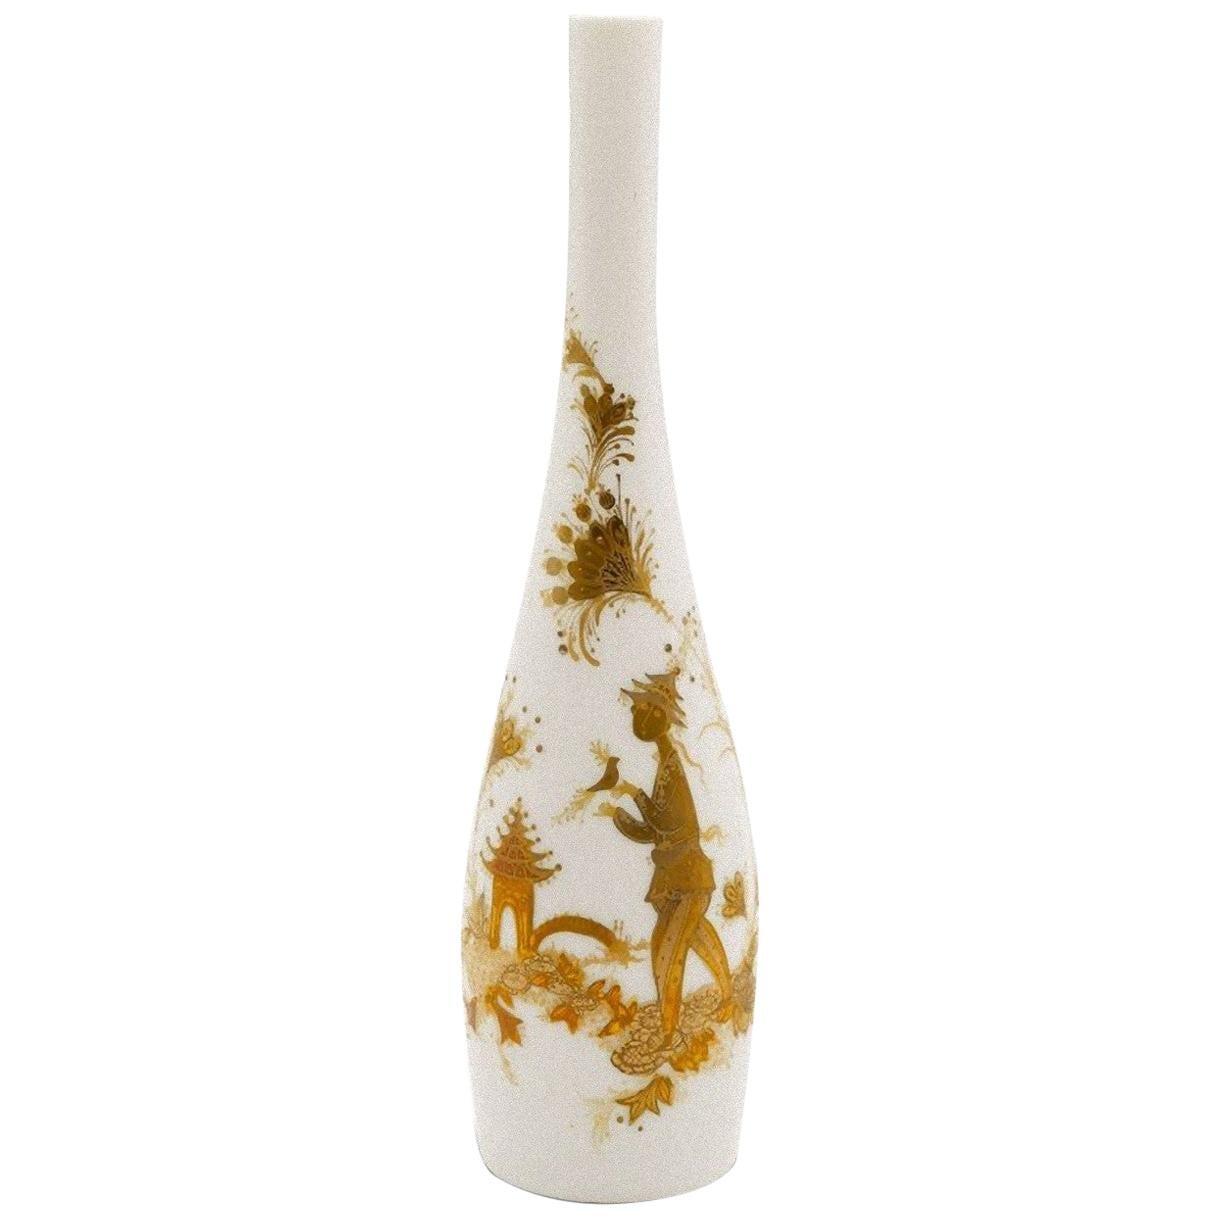 Rosenthal Vase, Bjorn Wiinblad for Rosenthal, Late 20th Century